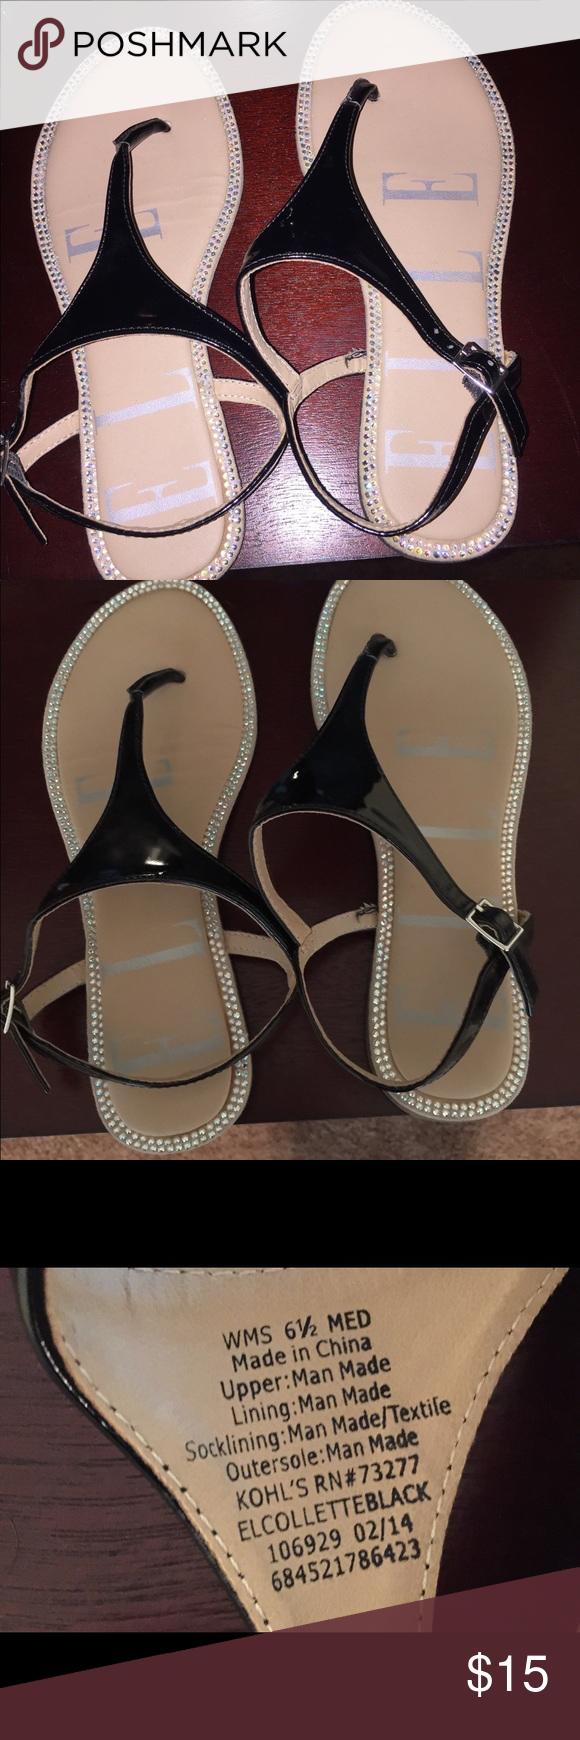 Elle Black & Rhinestone Sandals Size 6.5 Women's. Super cute Elle Sandals Size 6.5 Women's. Elle Shoes Sandals